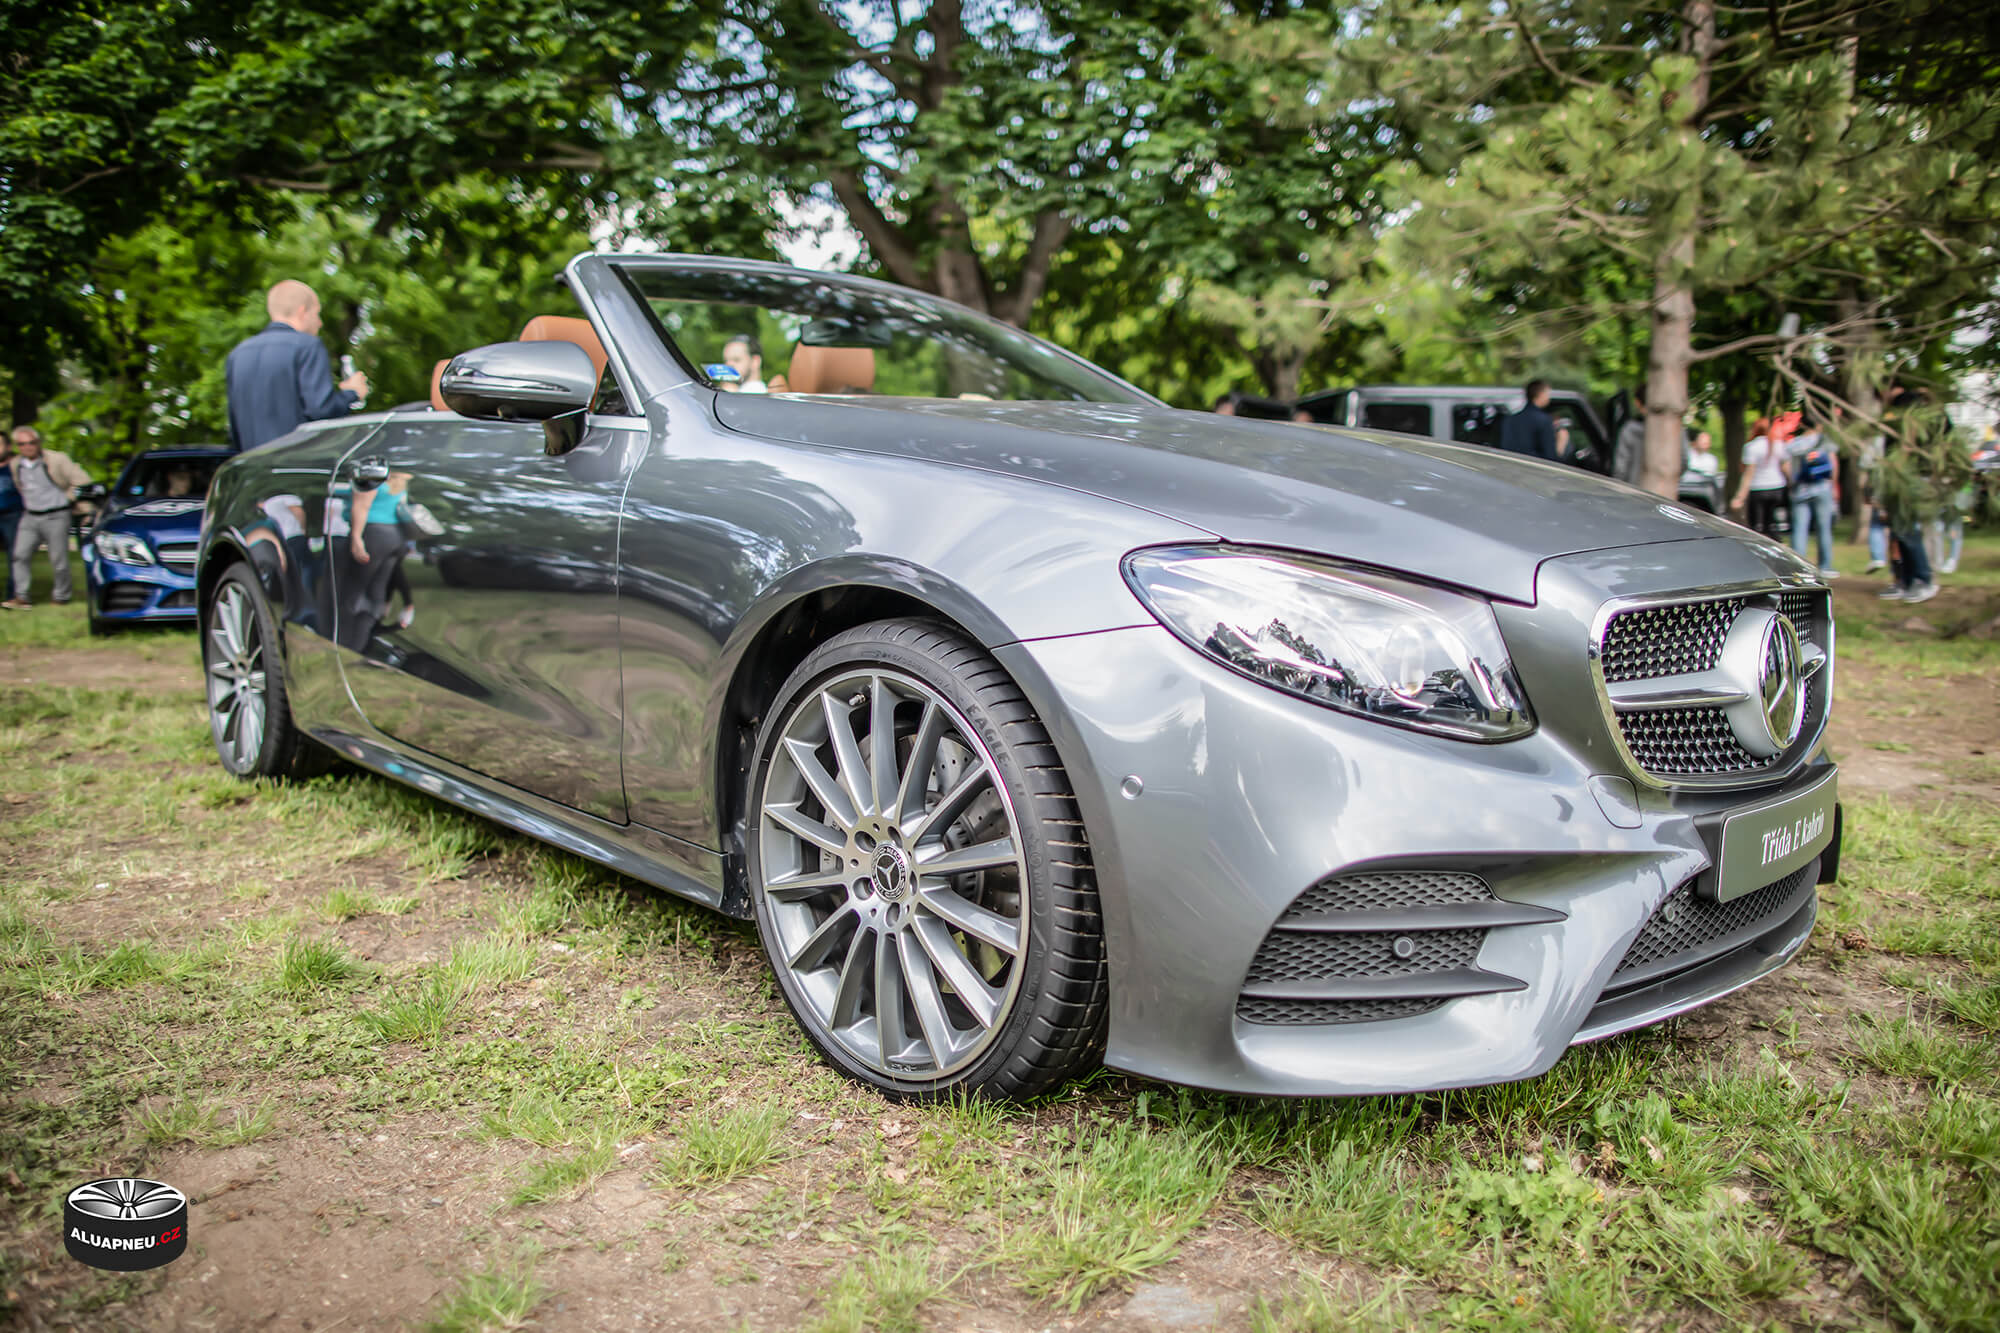 Originální leštěná alu kola Mercedes Benz - Automobilové Legendy 2019 - www.aluapneu.cz